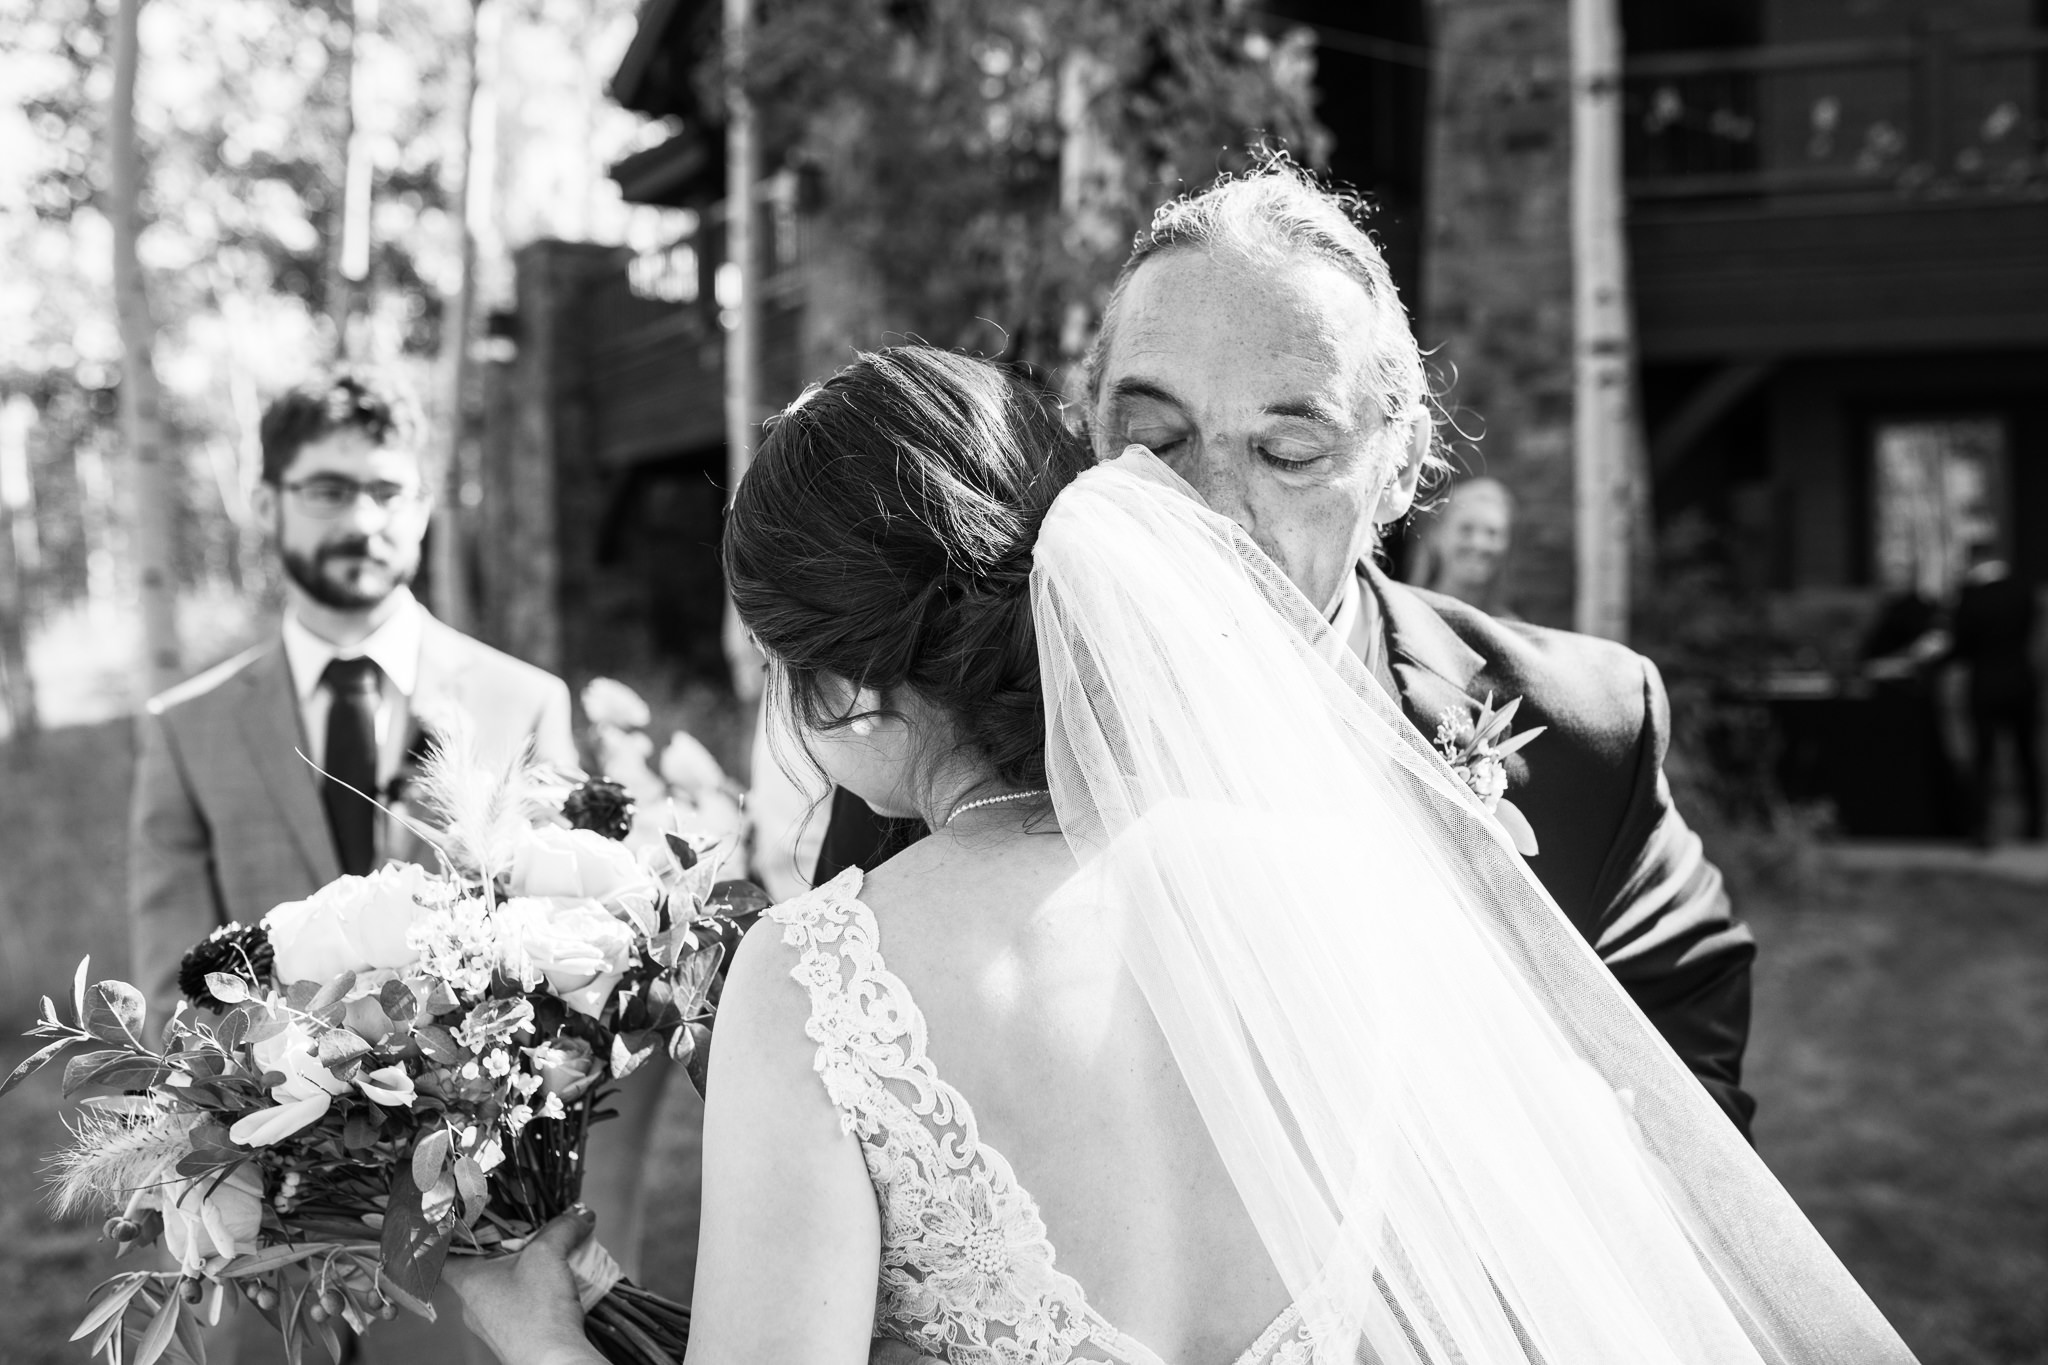 262_ONL_Kat_Nick_Wedding_Trevor_Hooper_Photo.jpg